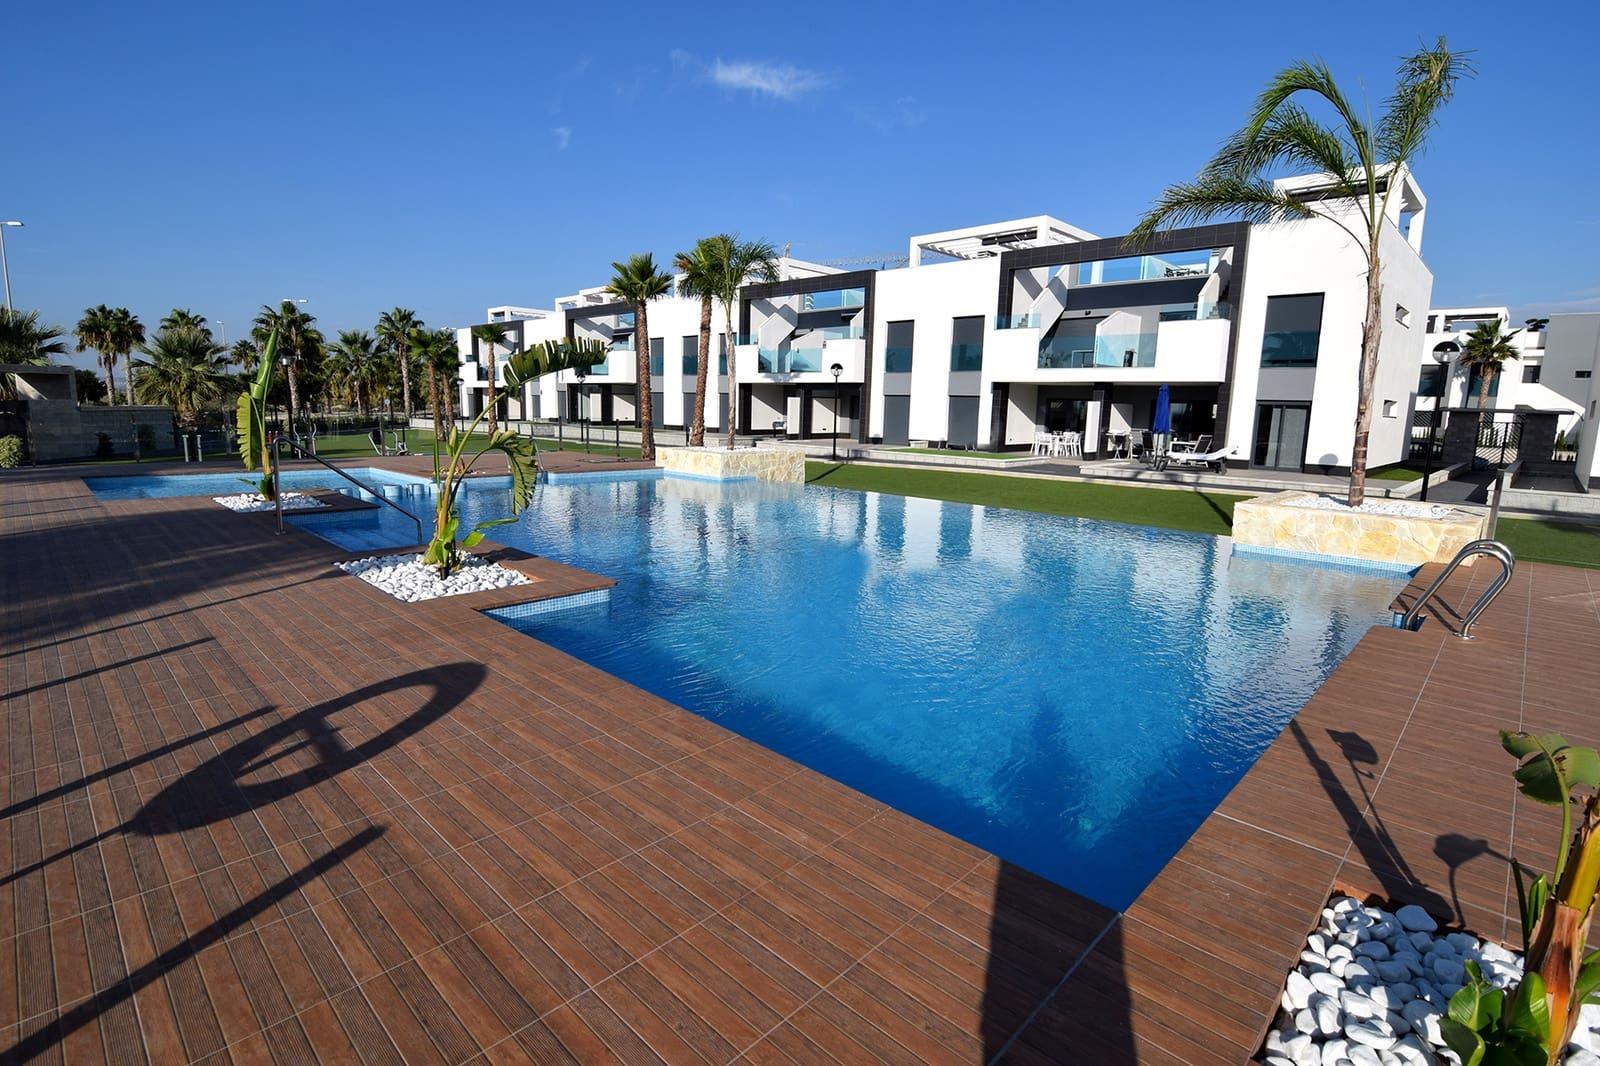 2 bedroom Apartment for sale in Guardamar del Segura with pool - € 212,000 (Ref: 4322749)